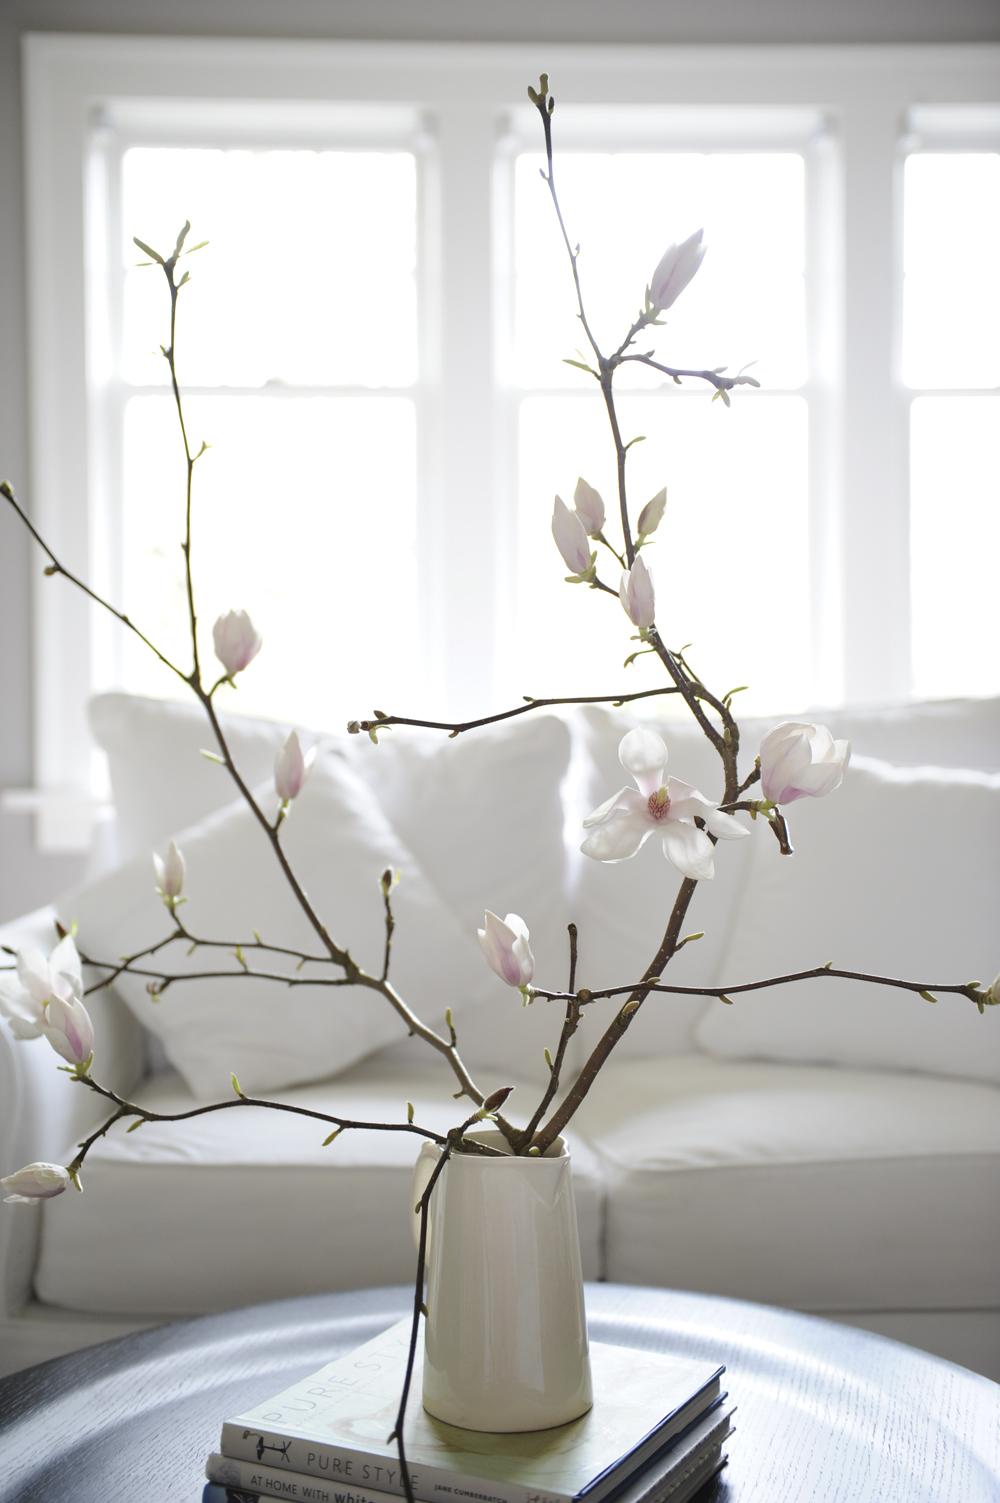 magnolias 2 Tracey Ayton Photography